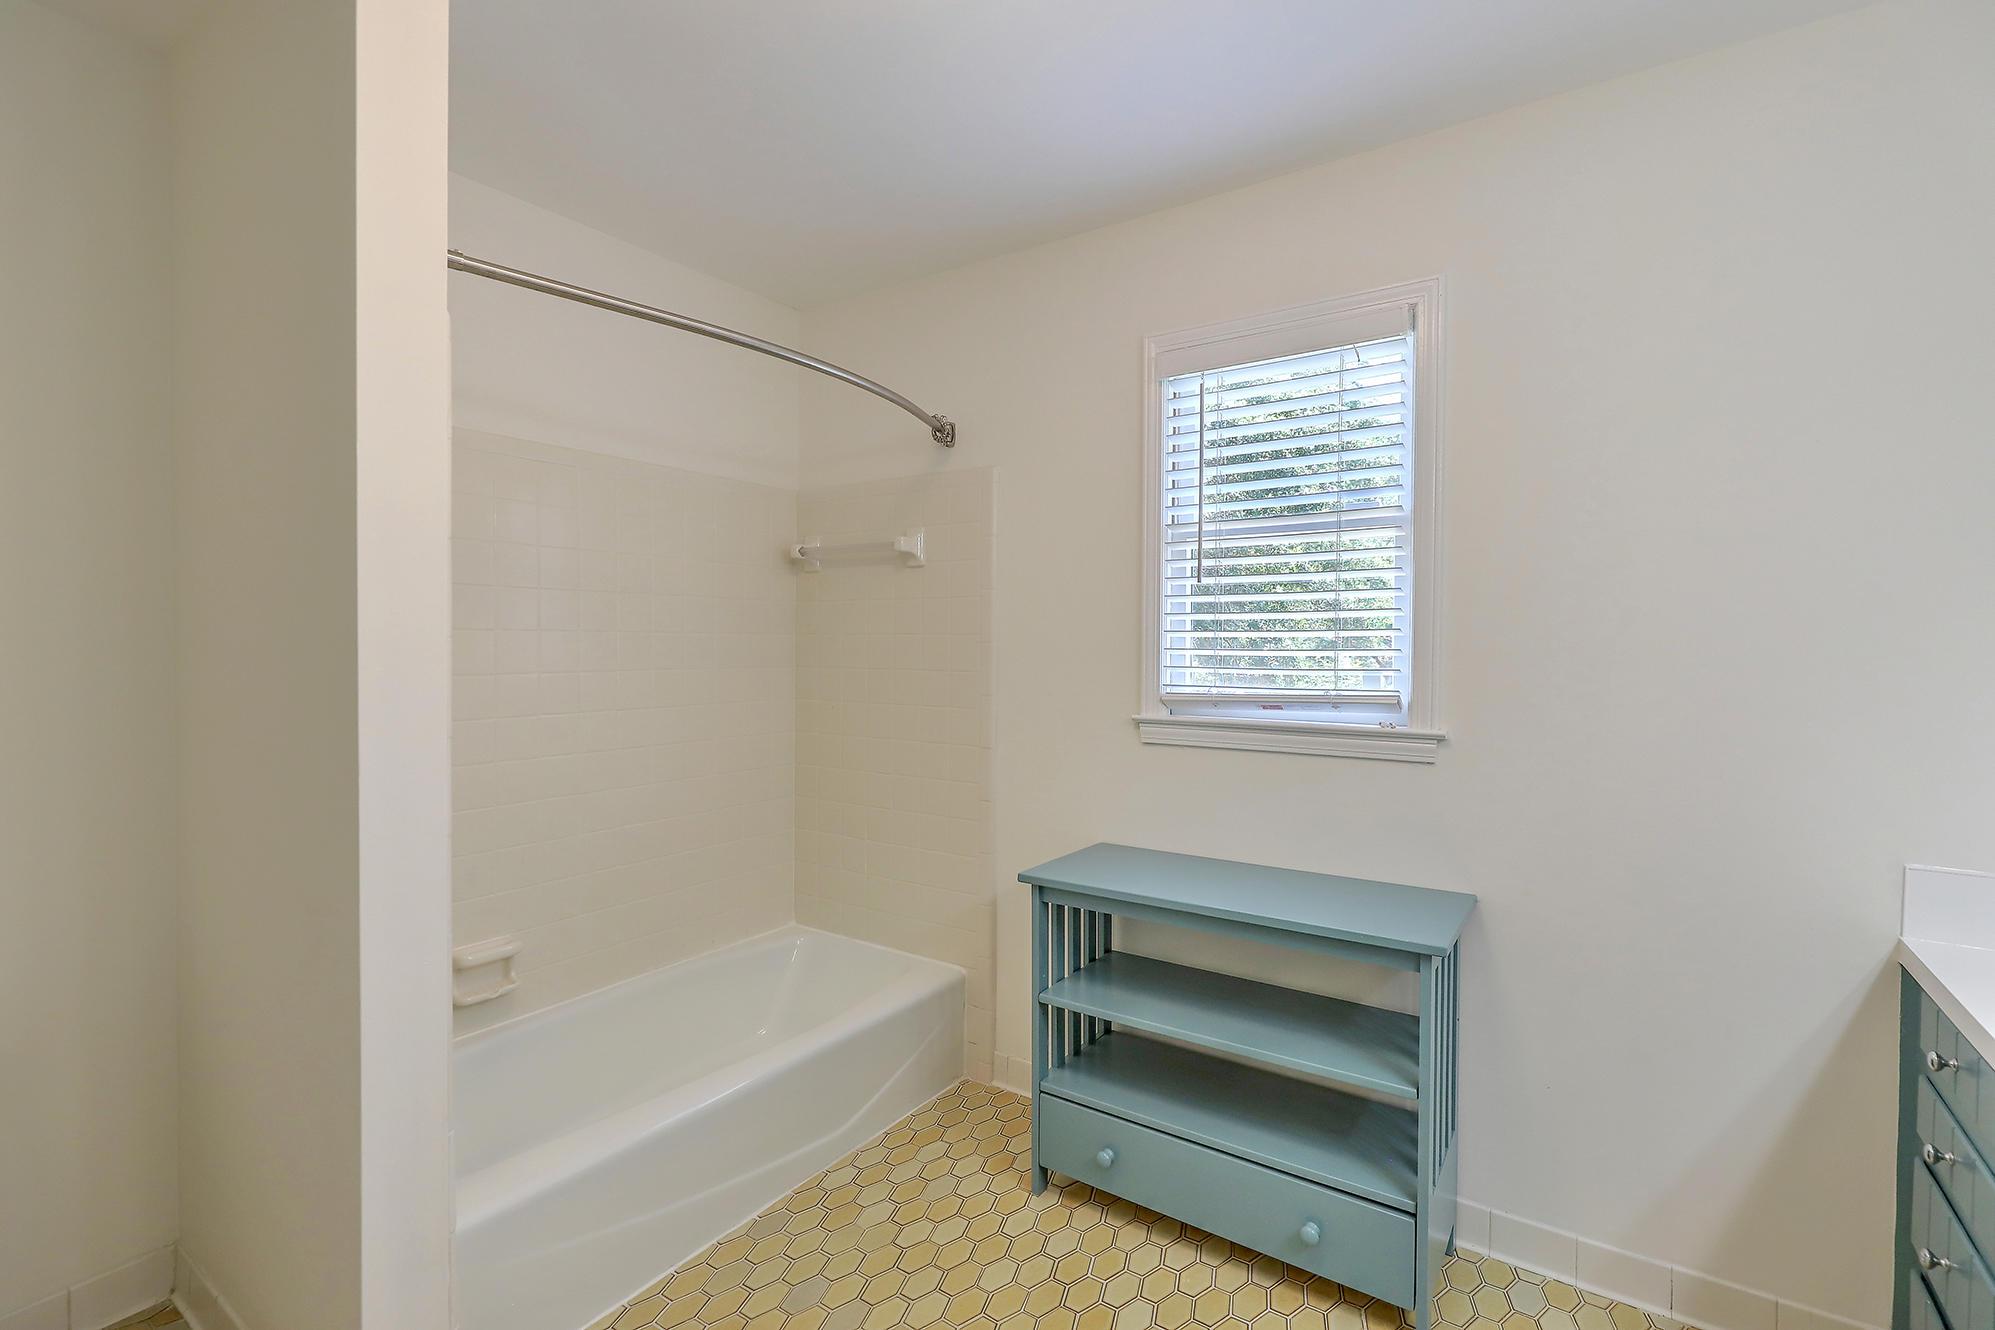 Edgewater Park Homes For Sale - 1413 Edsent, Charleston, SC - 16